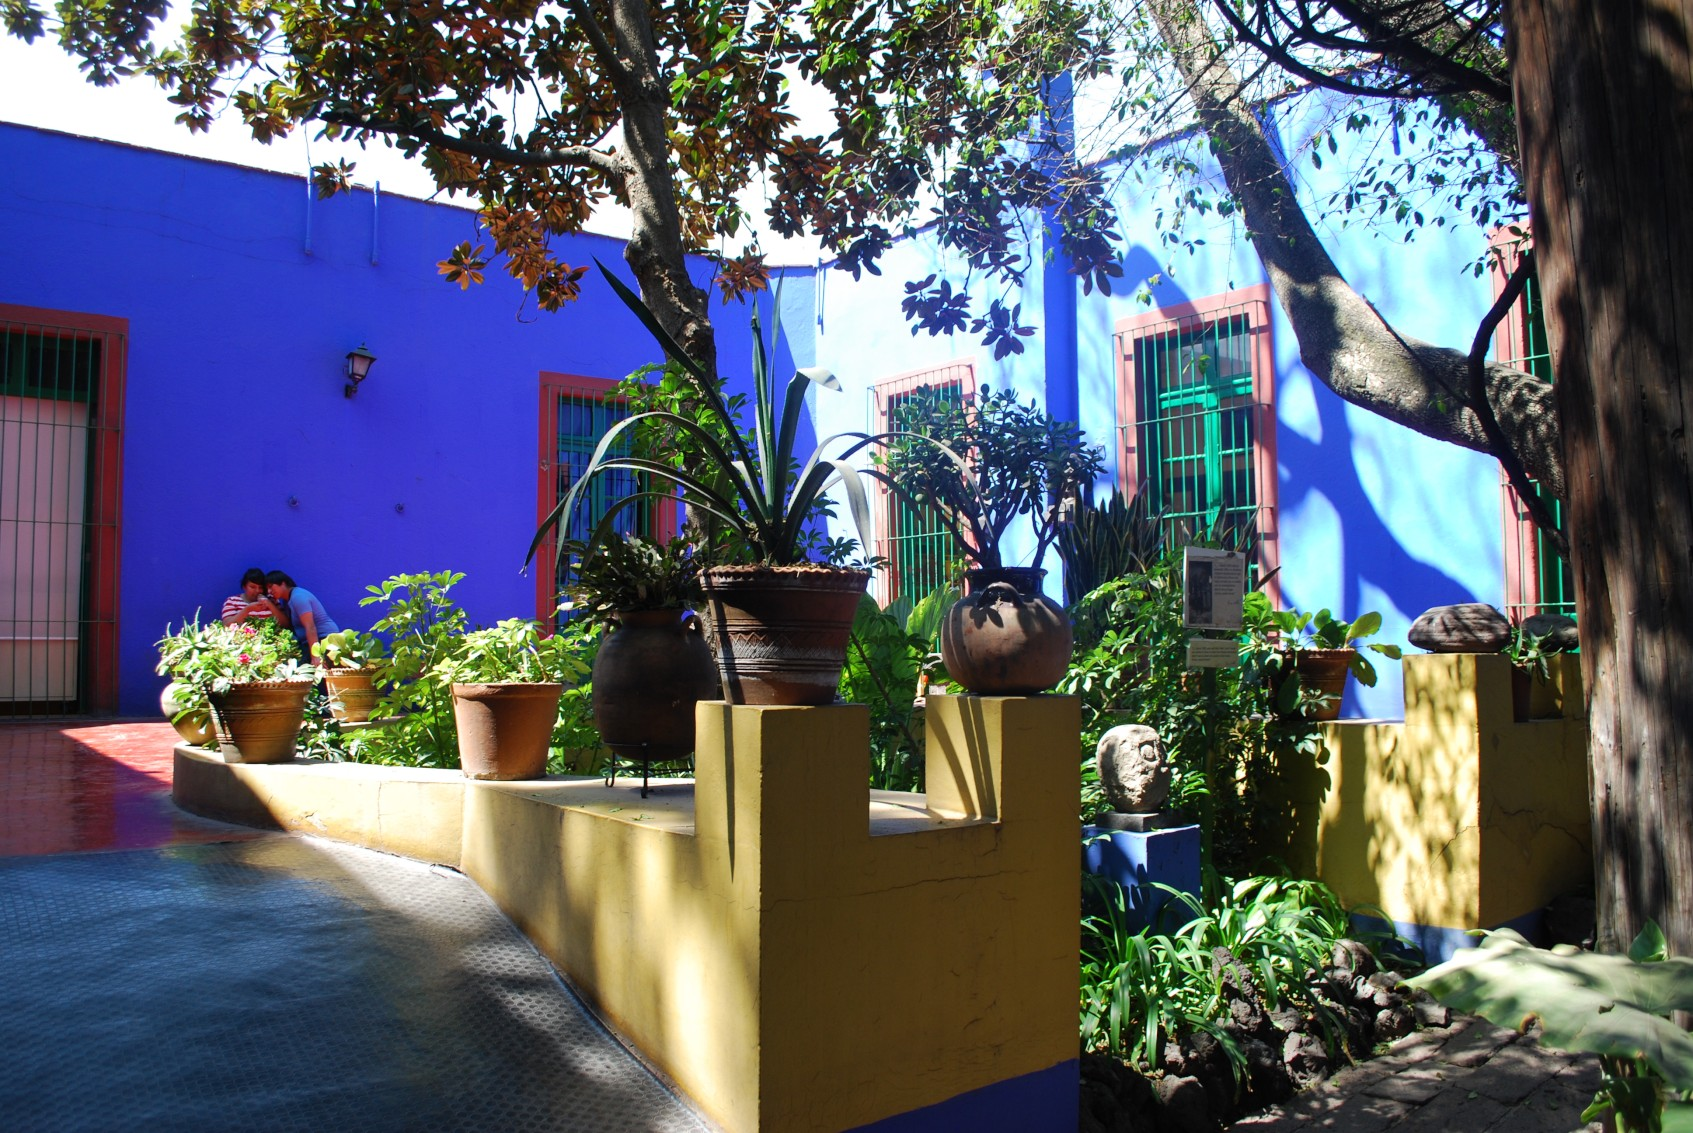 mex07-coyoacan-frida-kahlo-museum-free-cj